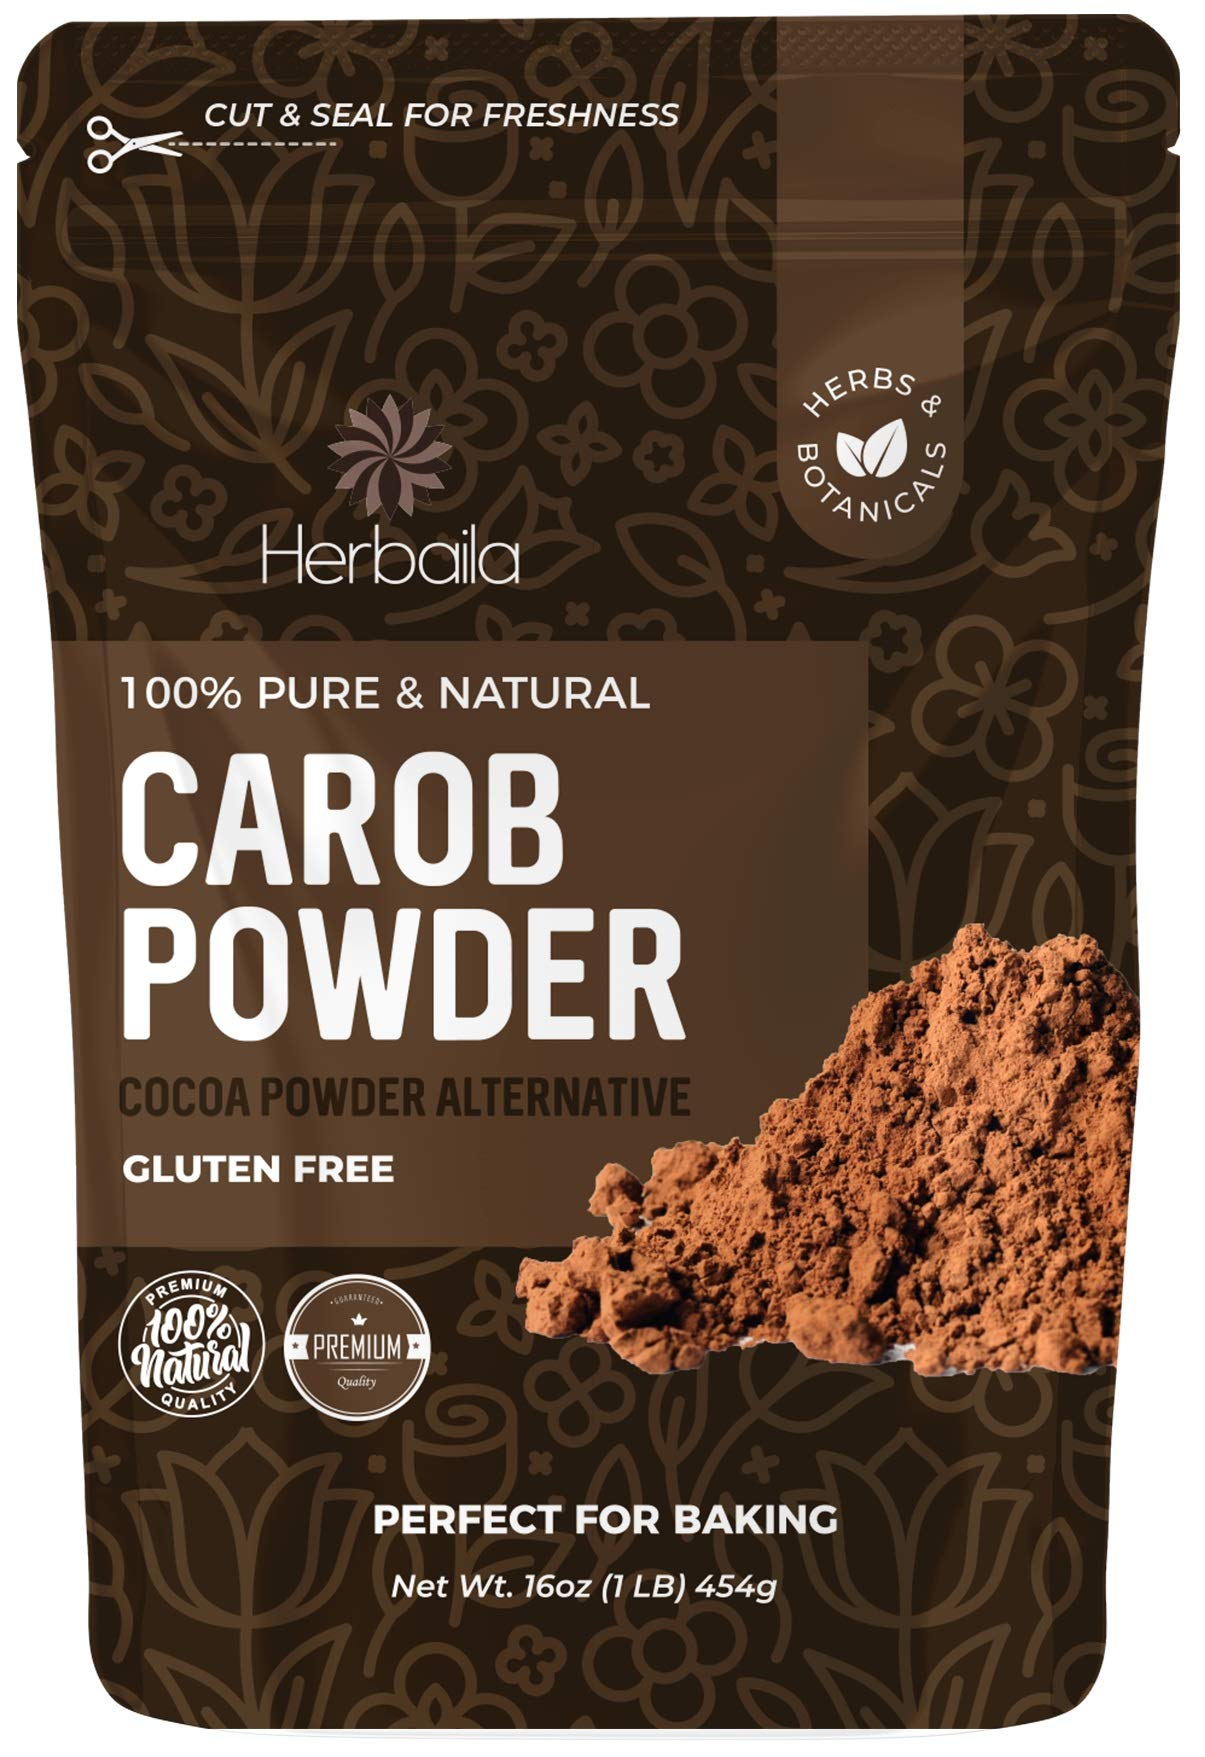 Carob powder, 1 lb. Raw Carob Powder, Carob Flour, Chocolate Substitute Carob, Unsweetened Carob Powder, Carob Chocolate Cocoa Powder Alternative. All Natural, Vegan, Paleo, Non-GMO.